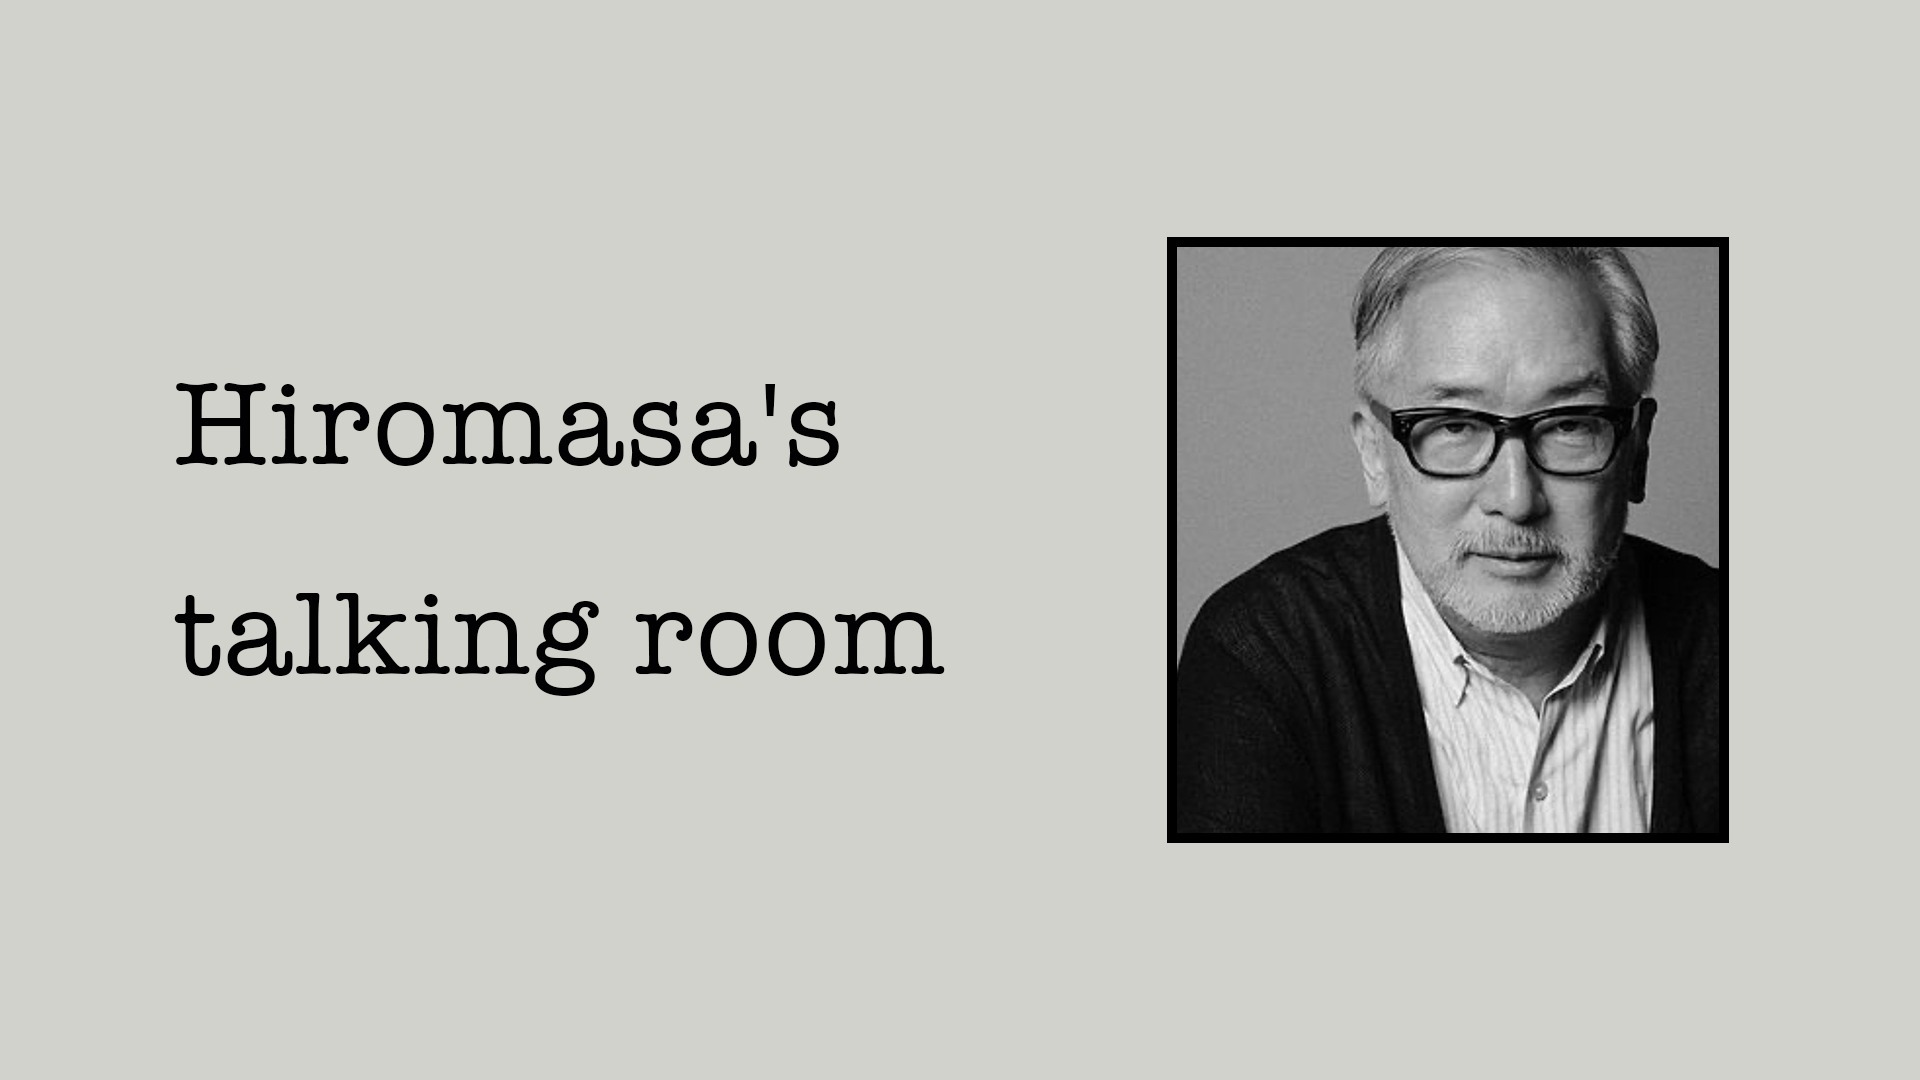 Hiromasa's talking room